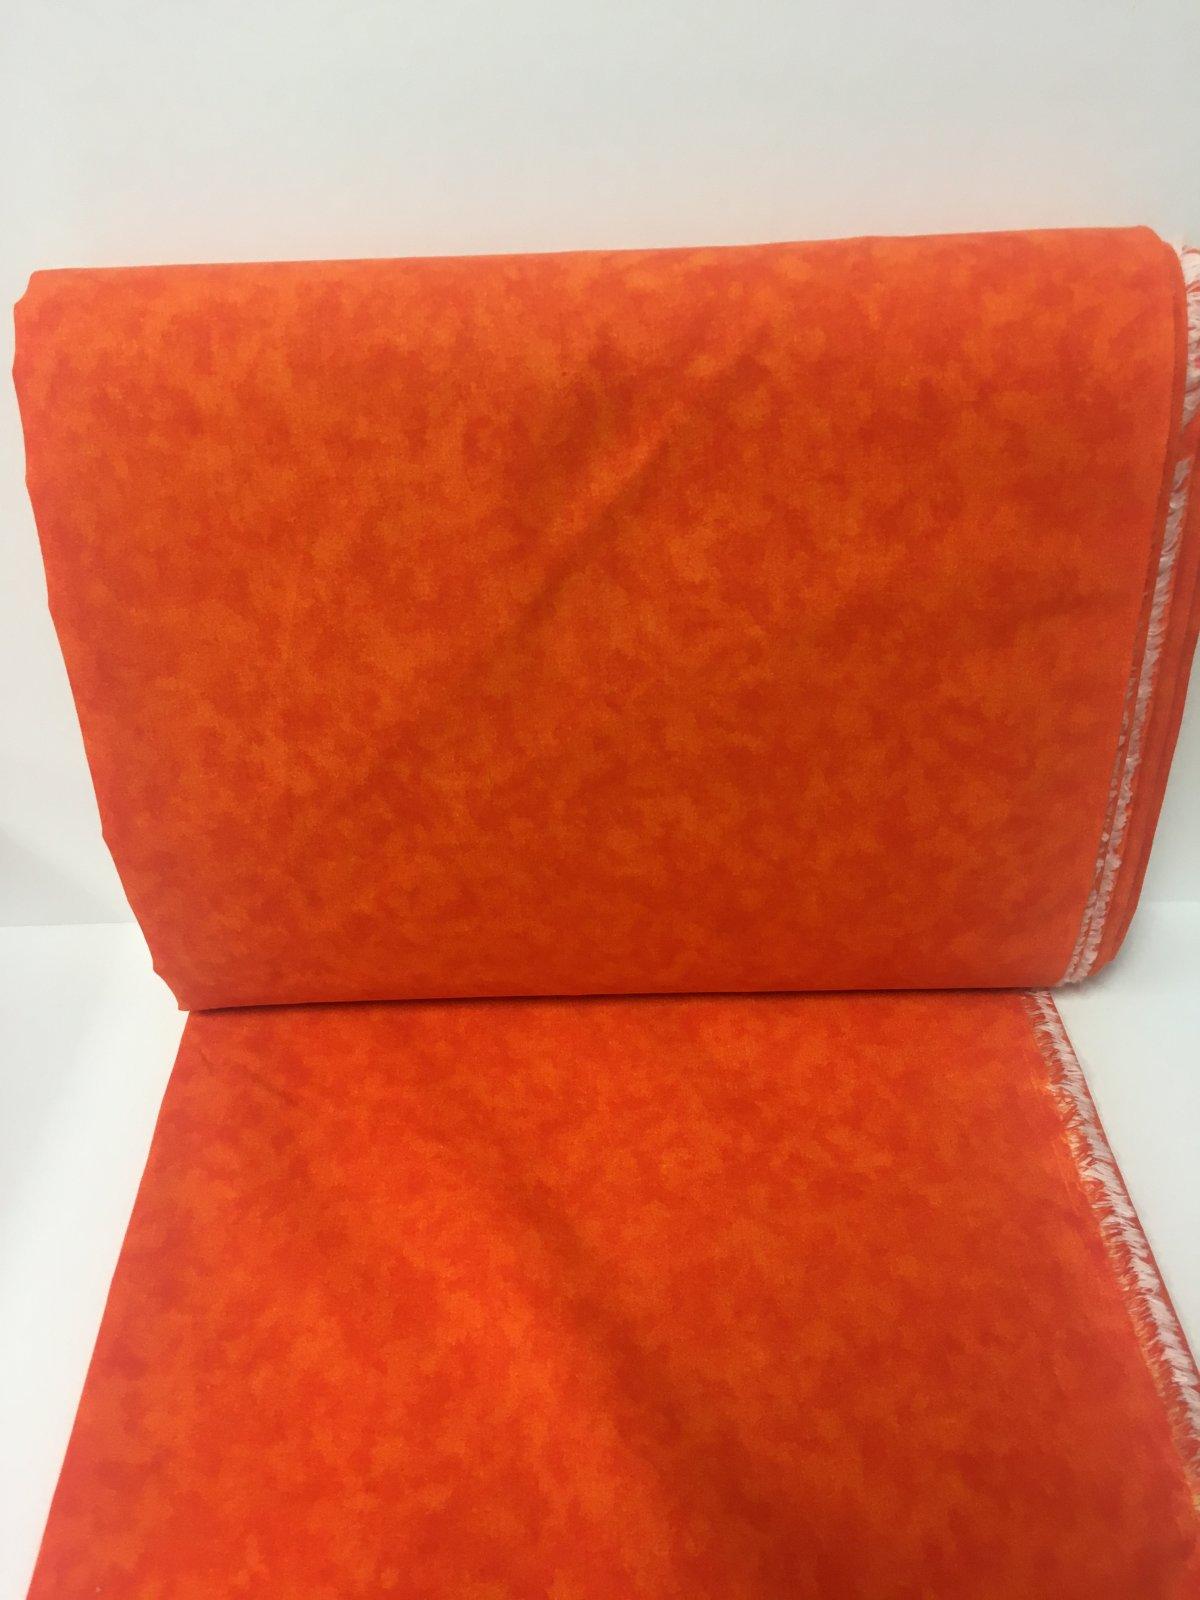 Blender Orange 43681-902